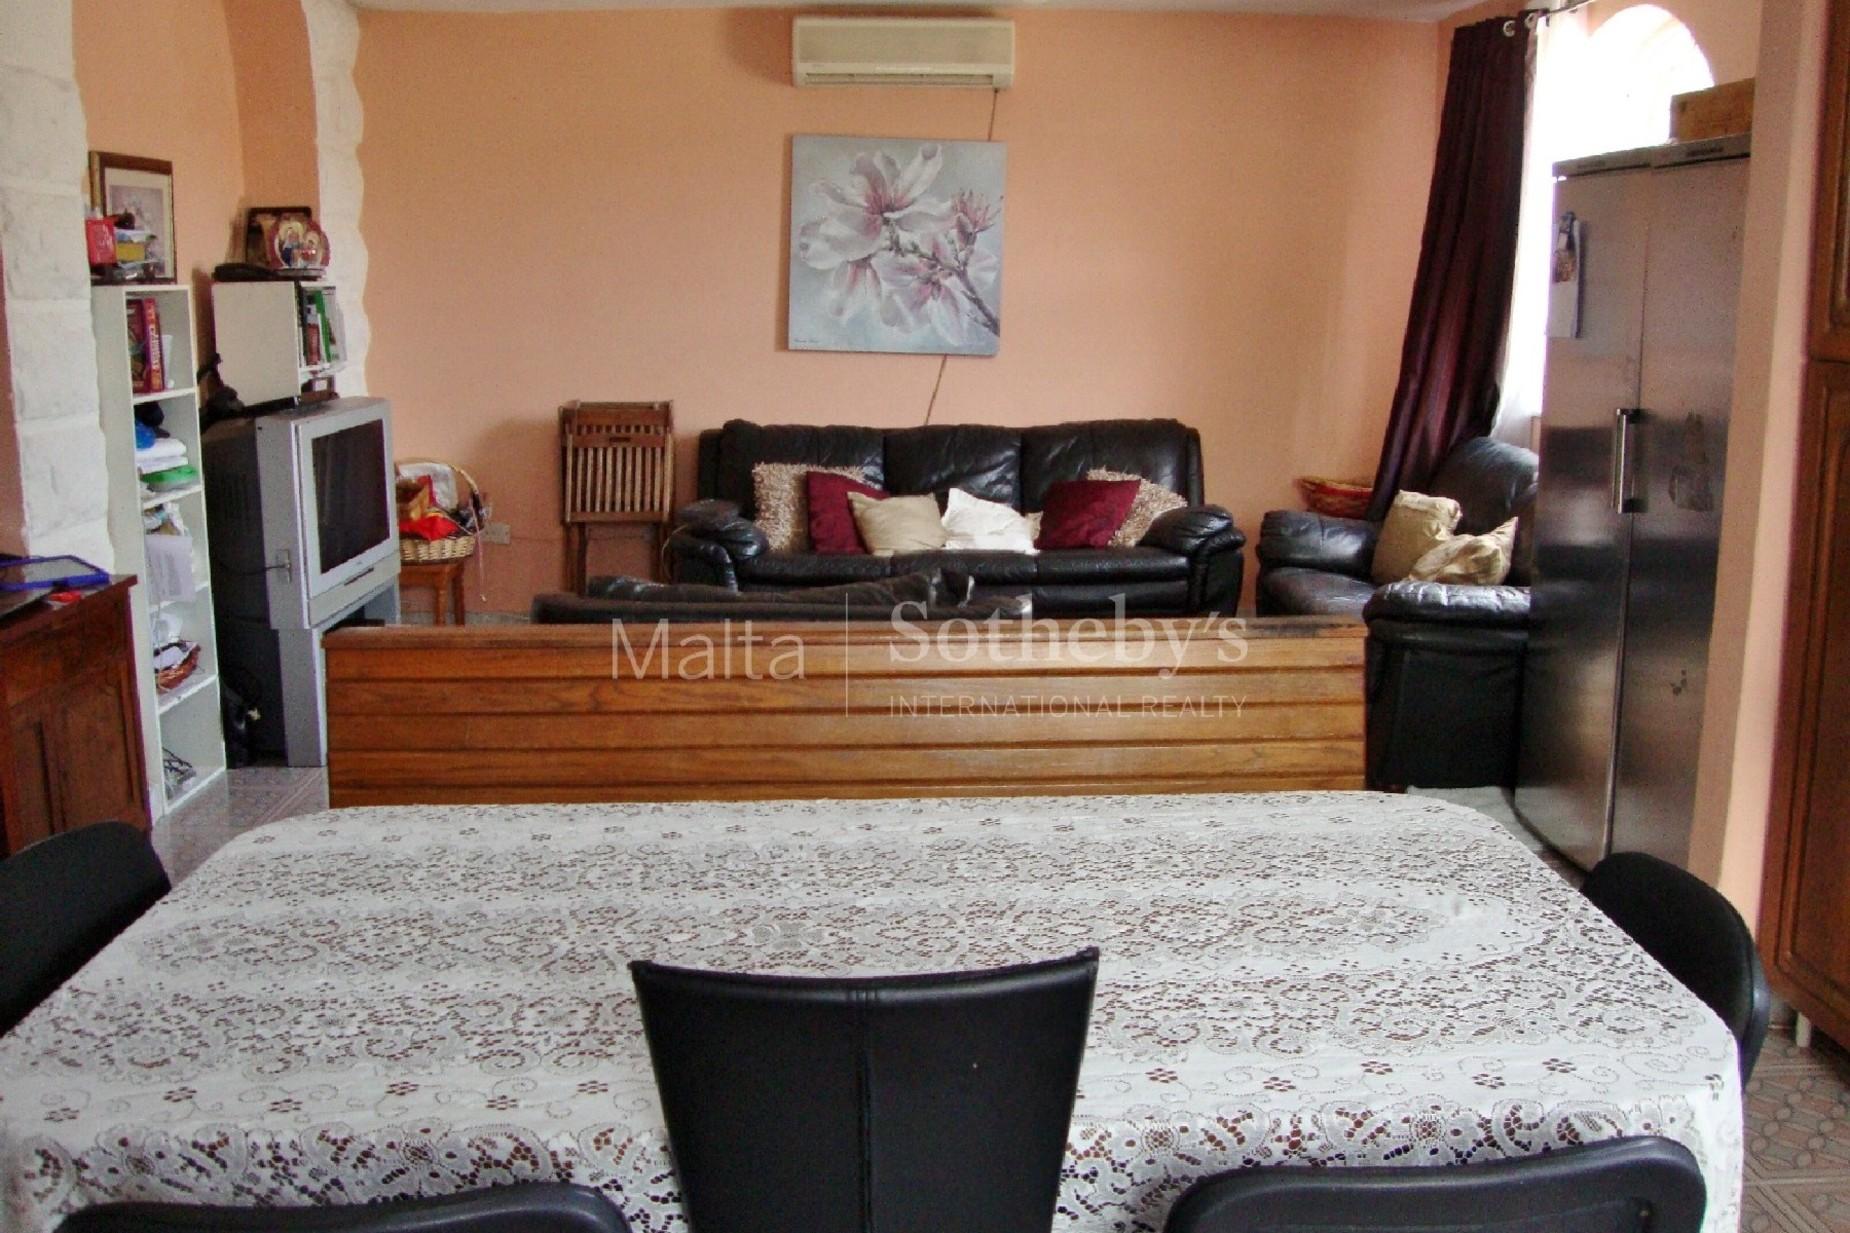 4 bed Villa For Sale in Rabat, Rabat - thumb 13